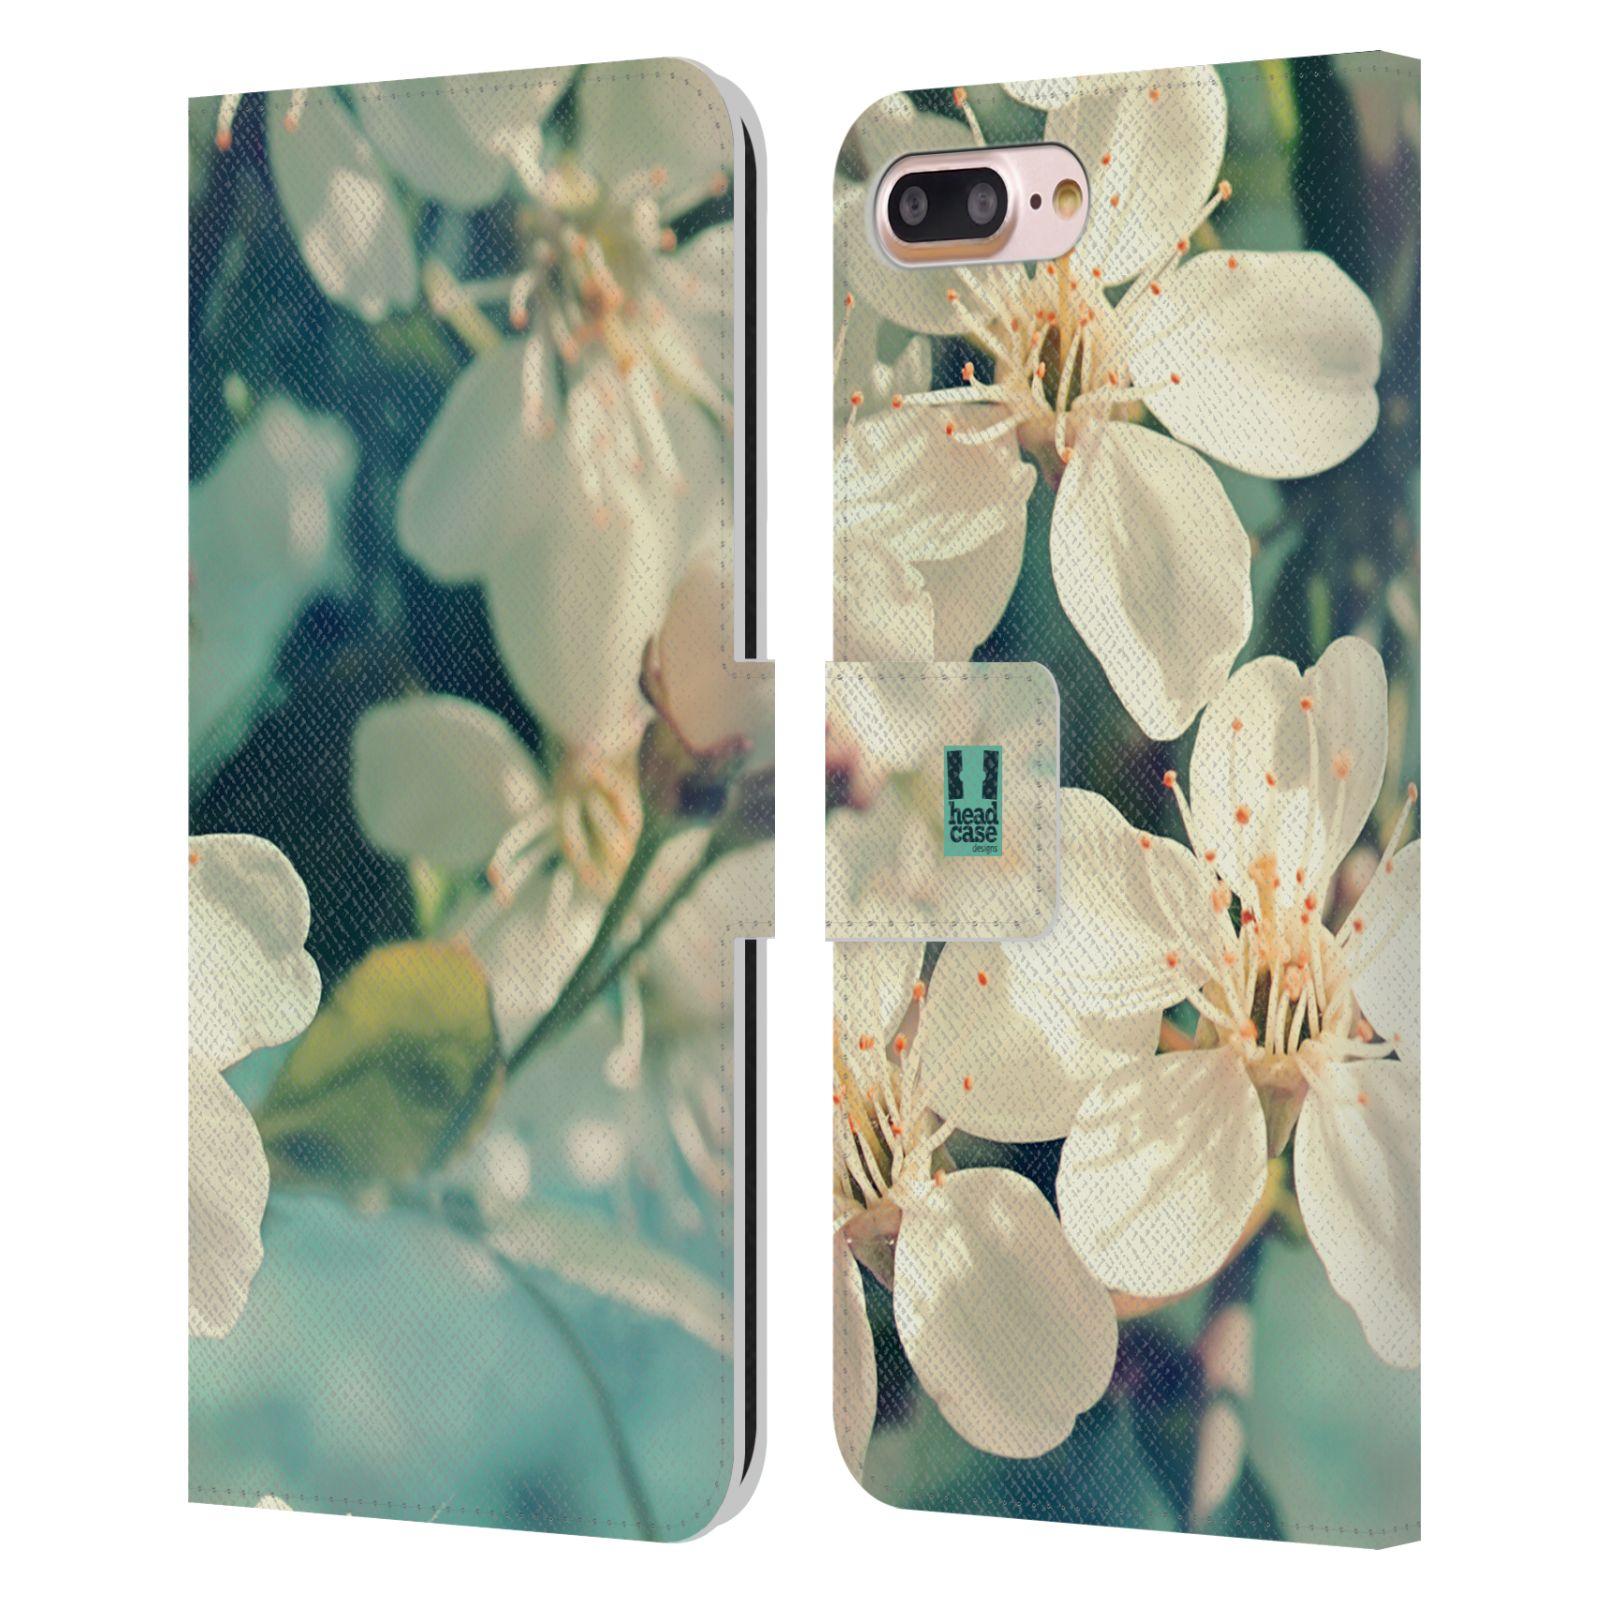 HEAD CASE Flipové pouzdro pro mobil Apple Iphone 7 PLUS / 8 PLUS květy foto rozkvetlá třešeň